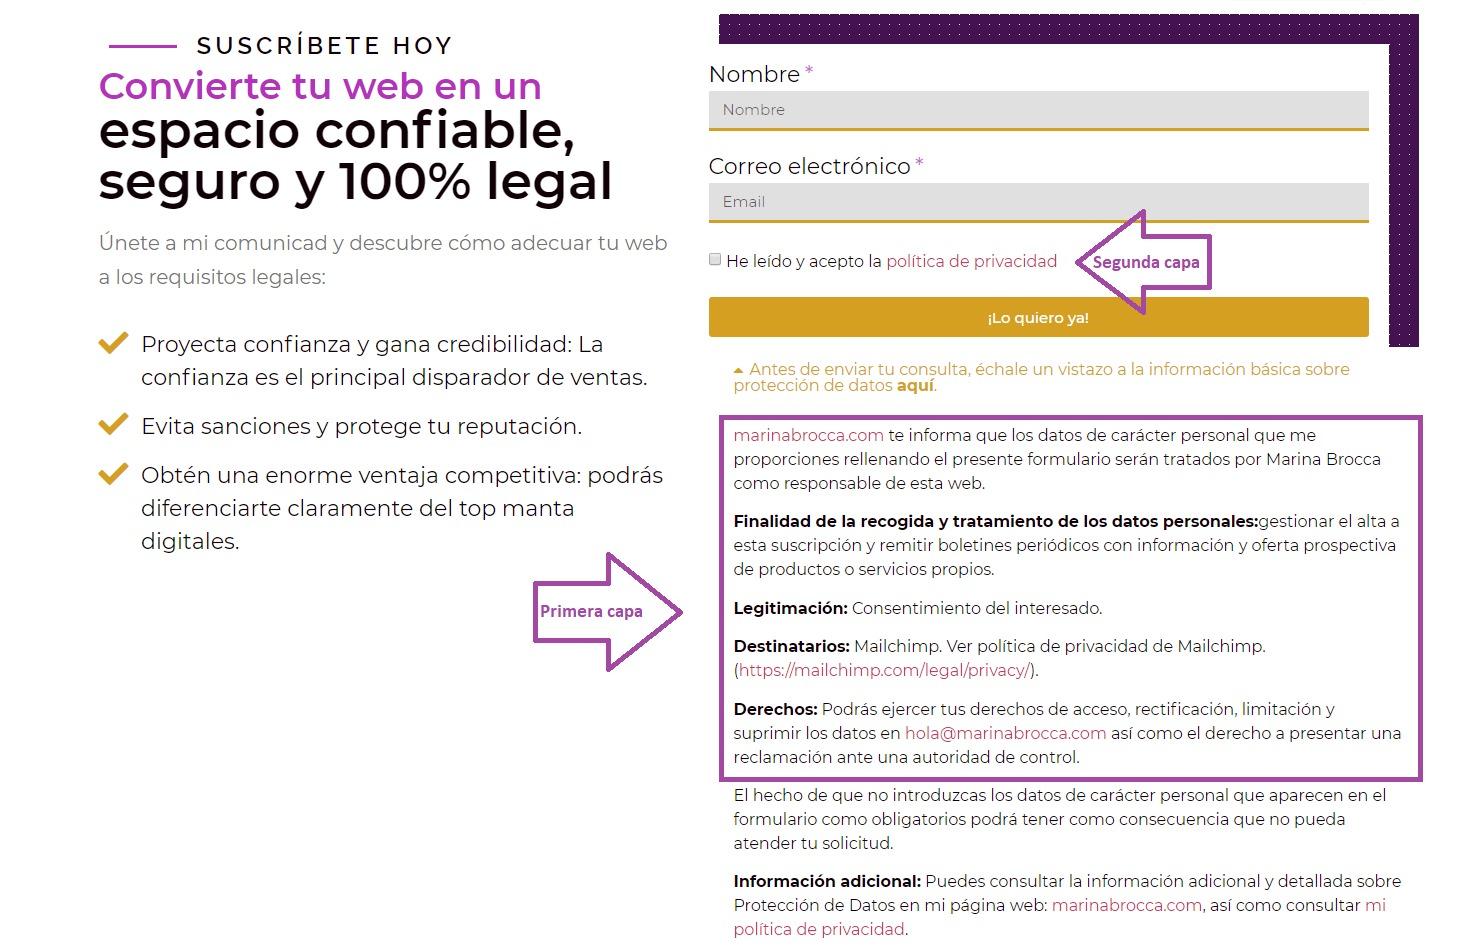 Lista de suscriptores - Modelo de formulario legal